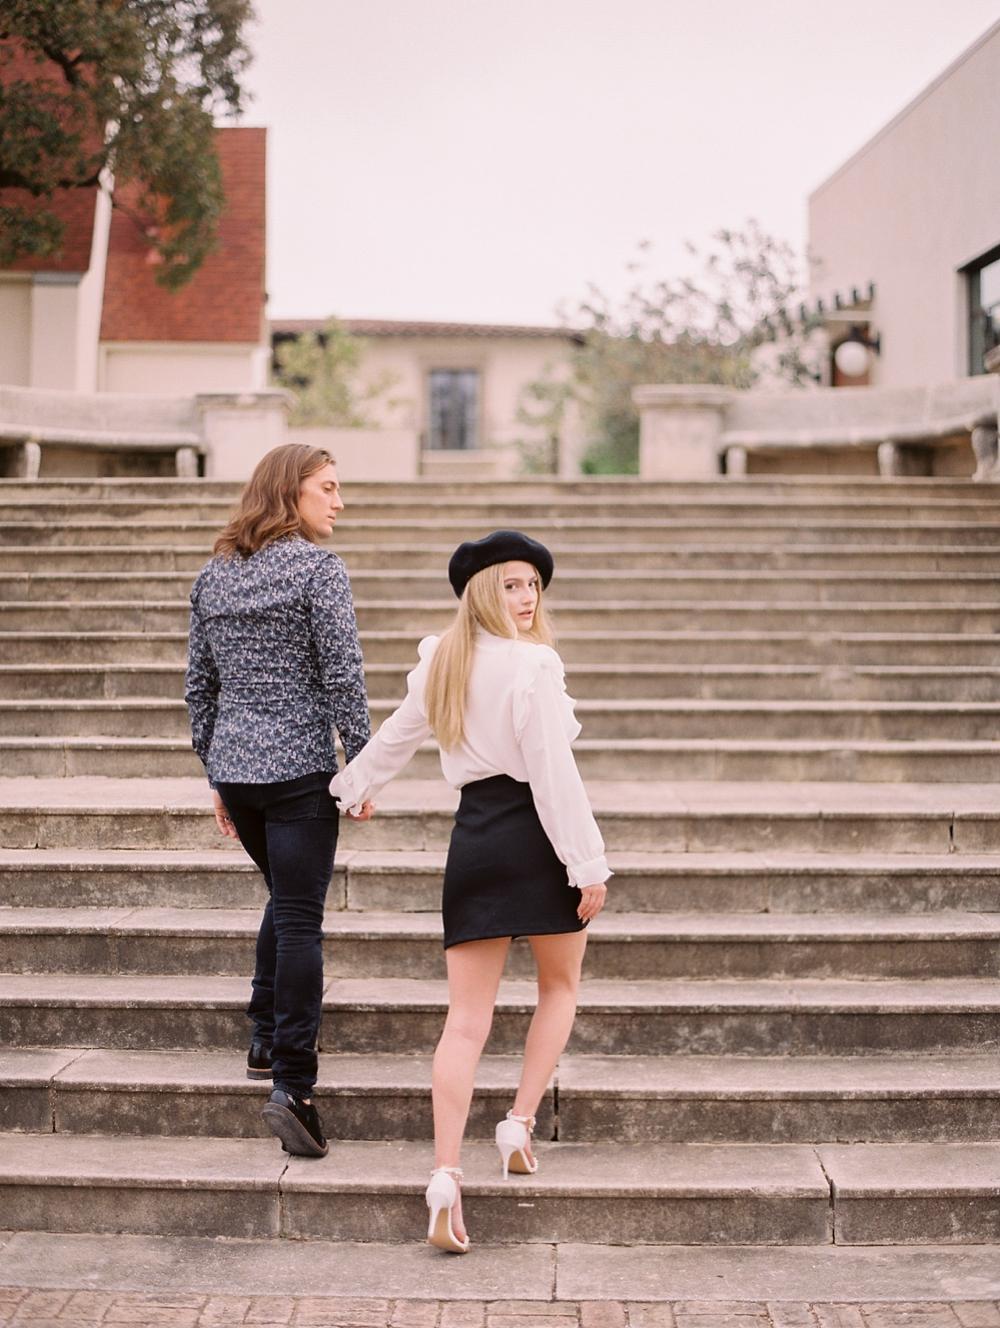 kristin-la-voie-photography-Austin-Wedding-Boudoir-Photographer-Commodore-Perry-Estate-19